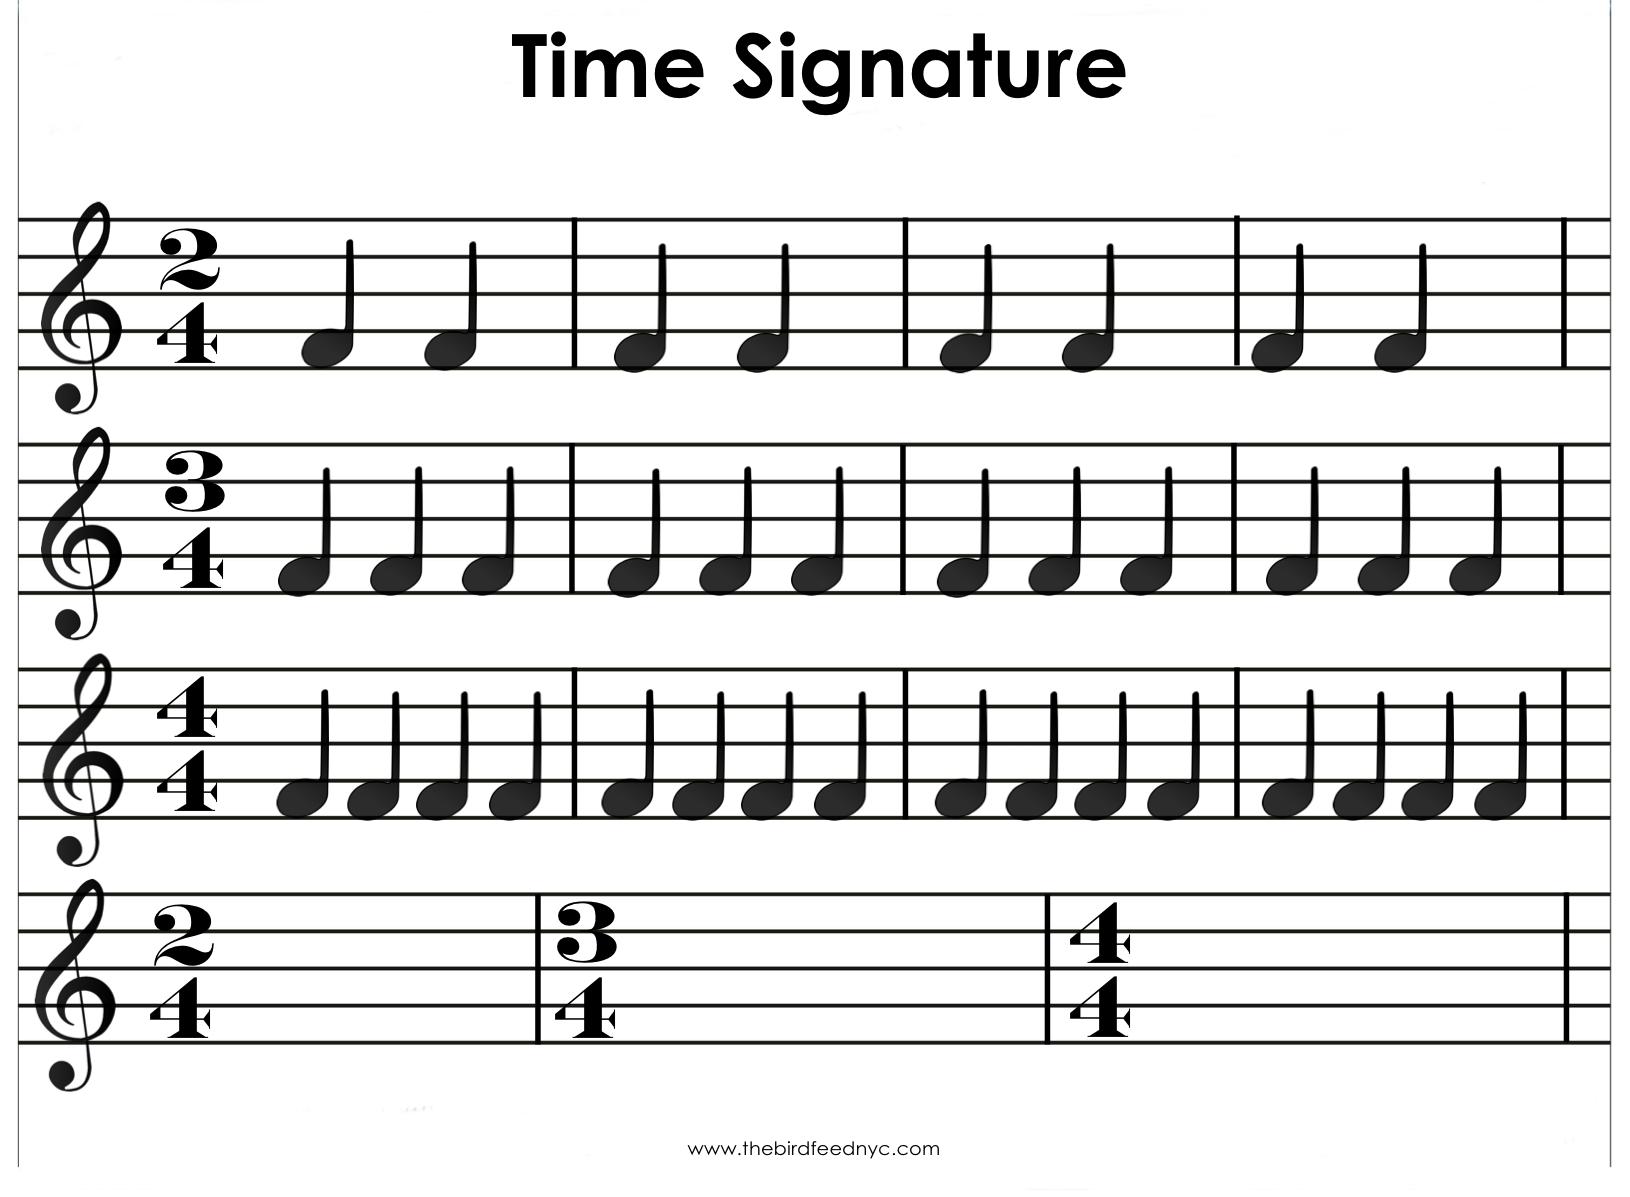 Time Signature Activity Sheet